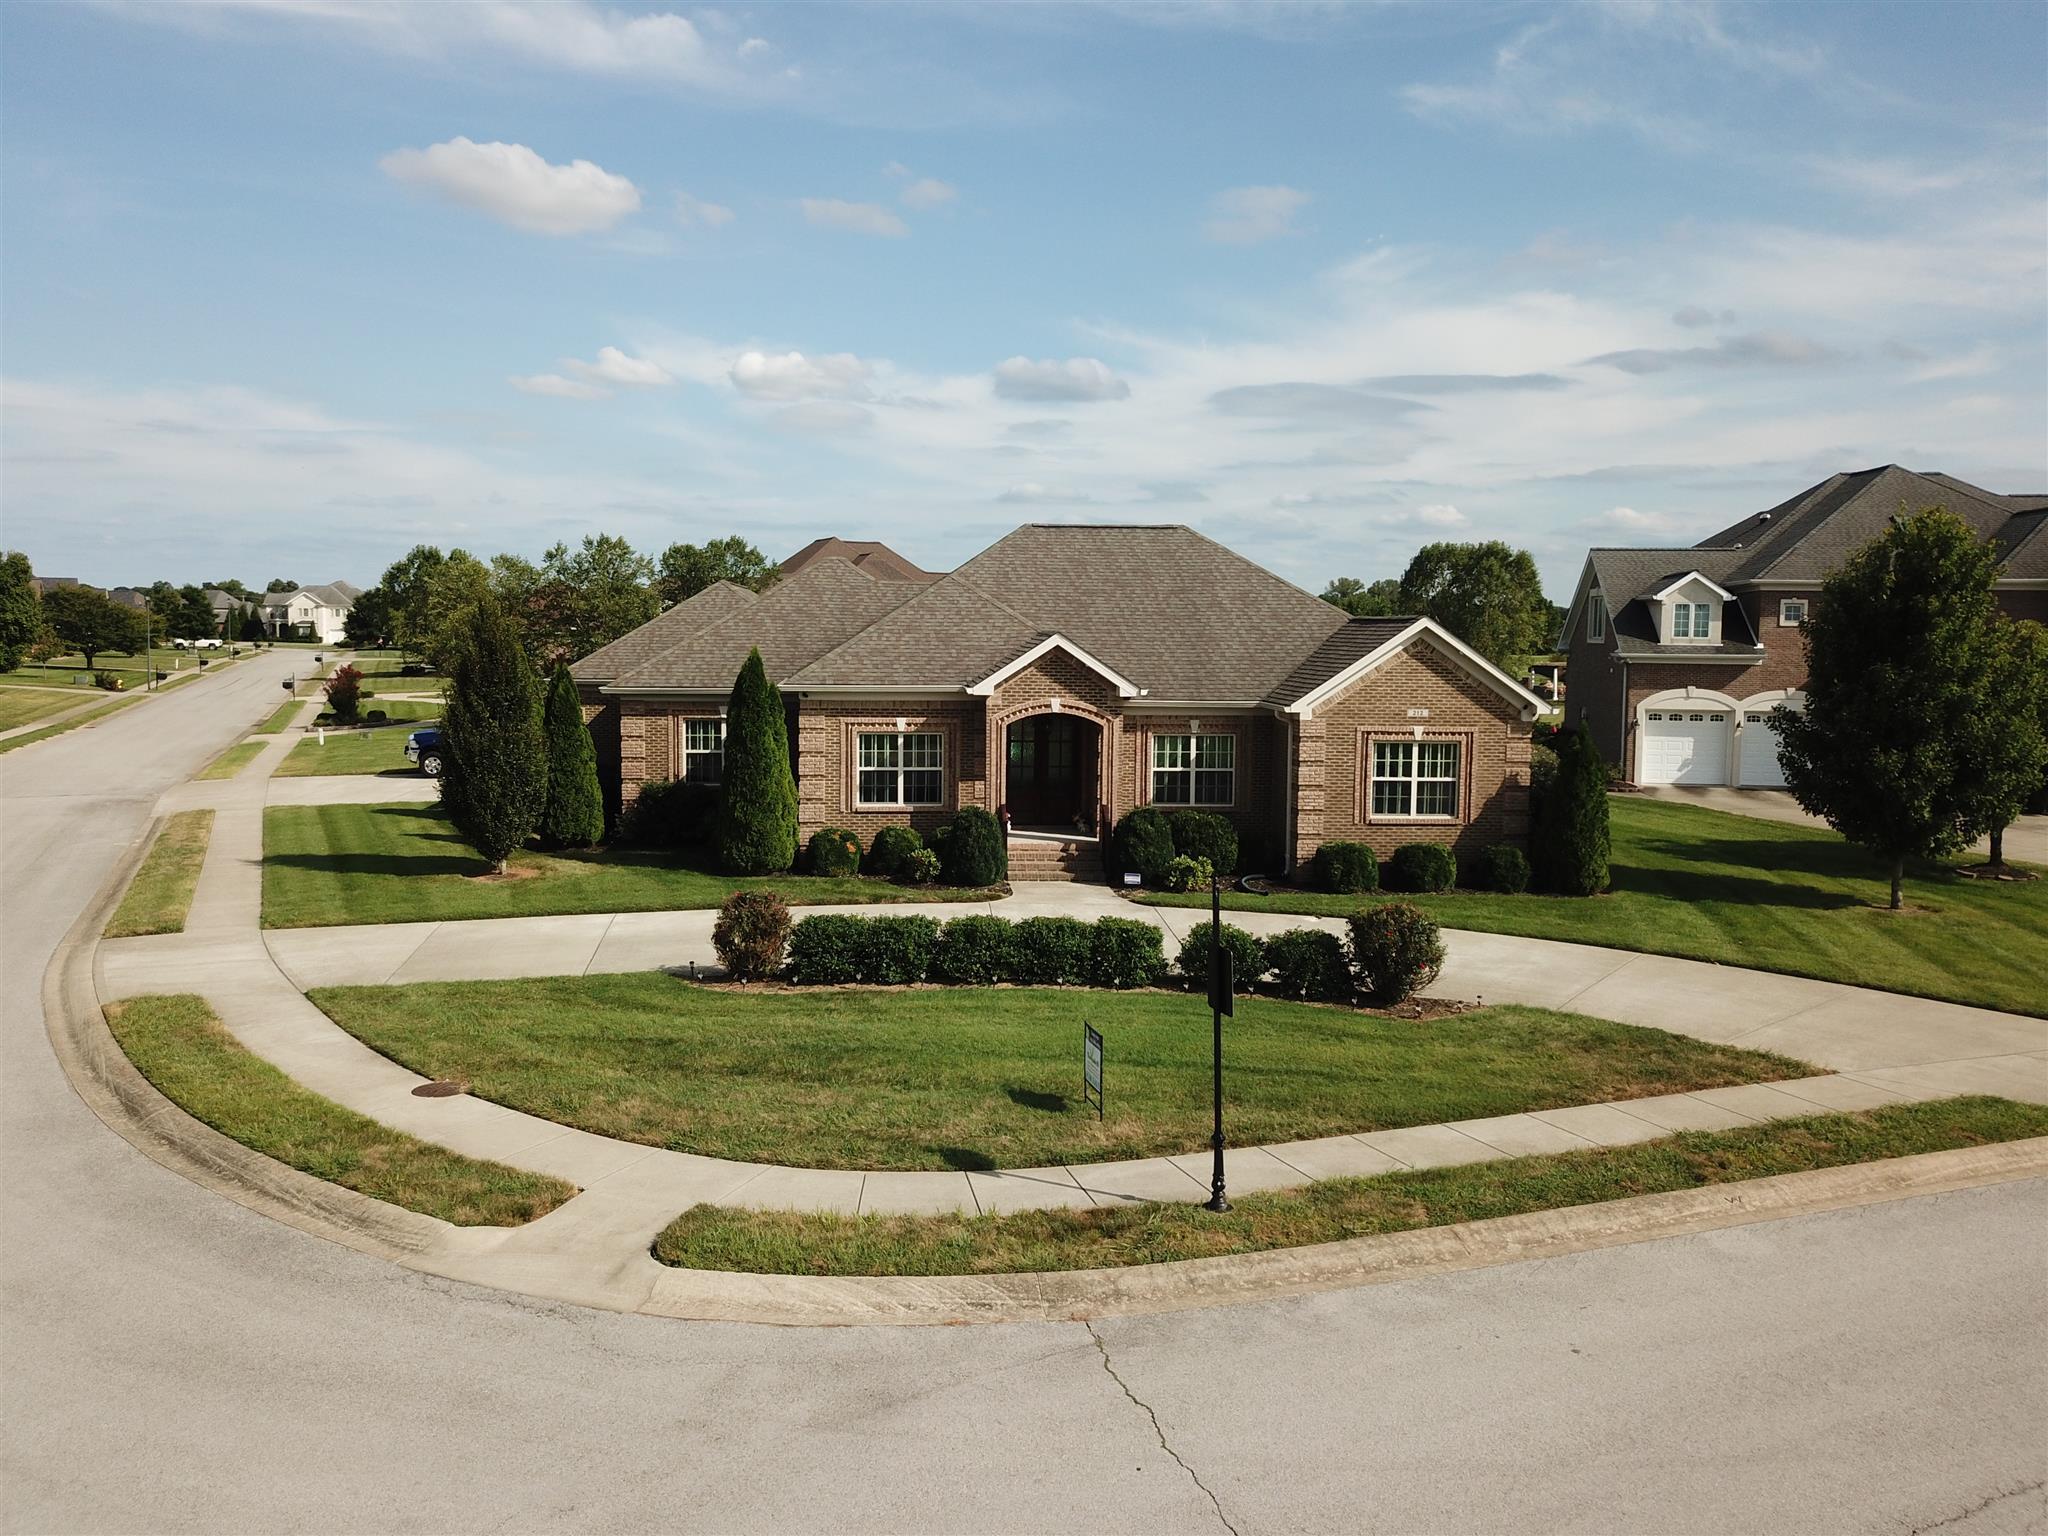 212 Wellington Way, Hopkinsville, KY 42240 - Hopkinsville, KY real estate listing